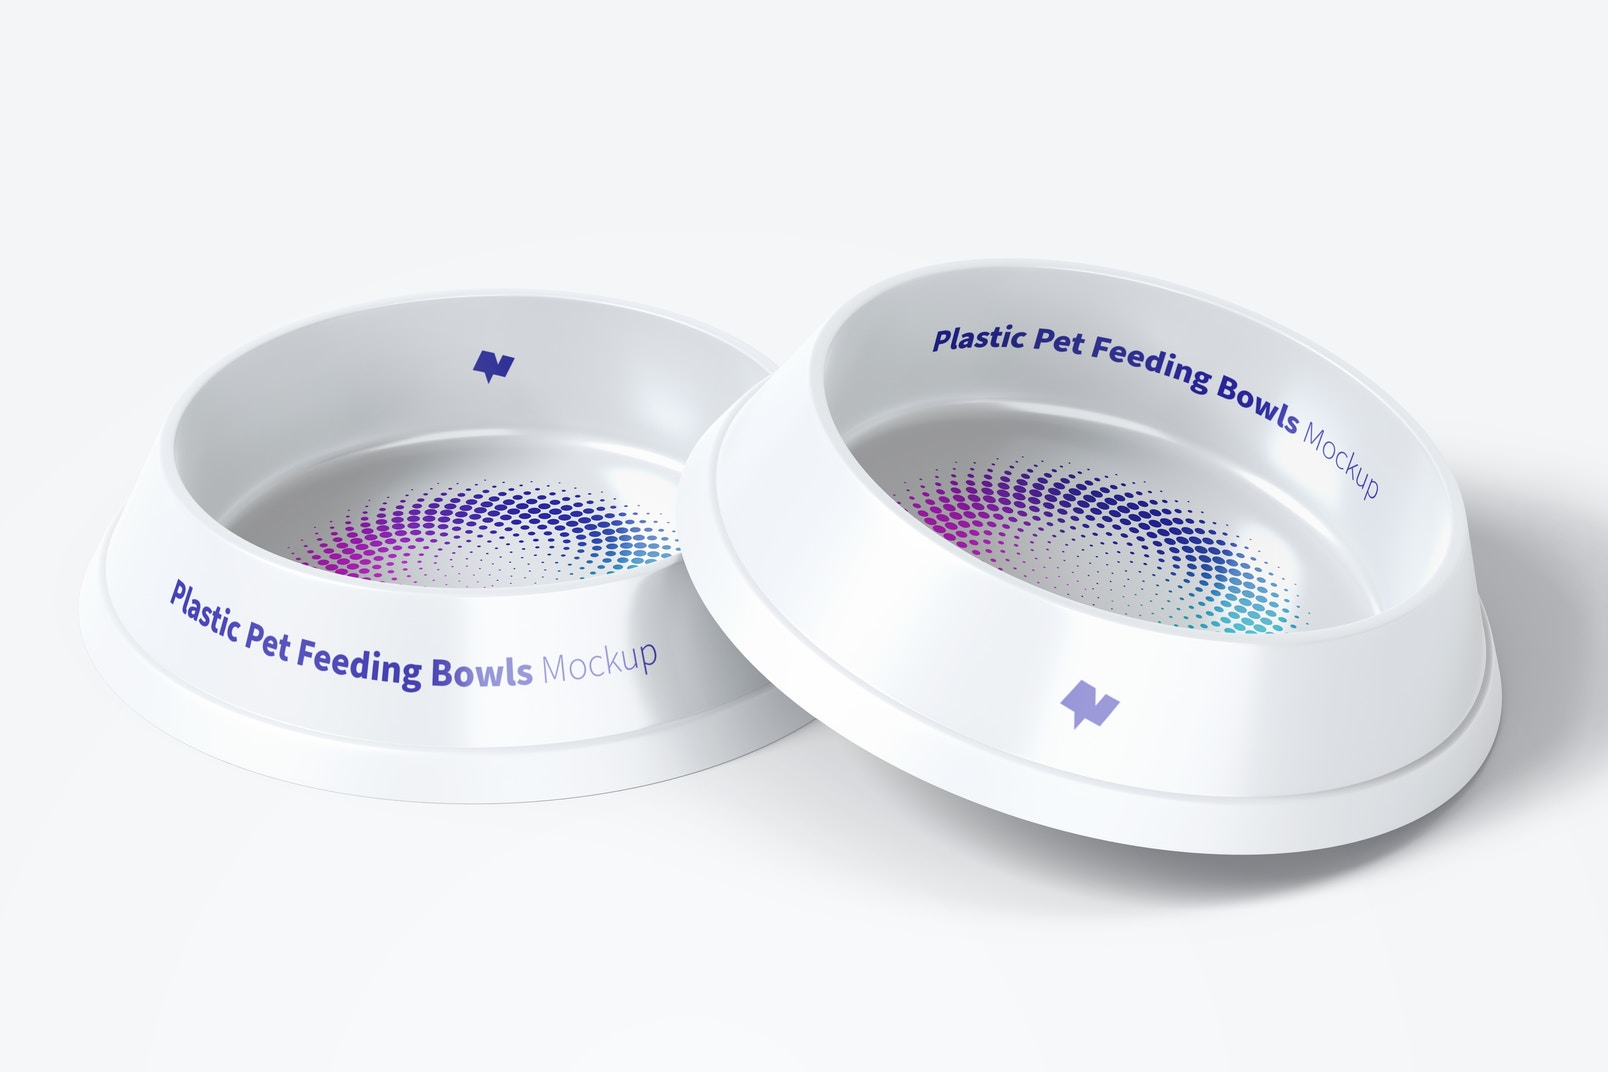 Plastic Pet Feeding Bowls Mockup, Front View